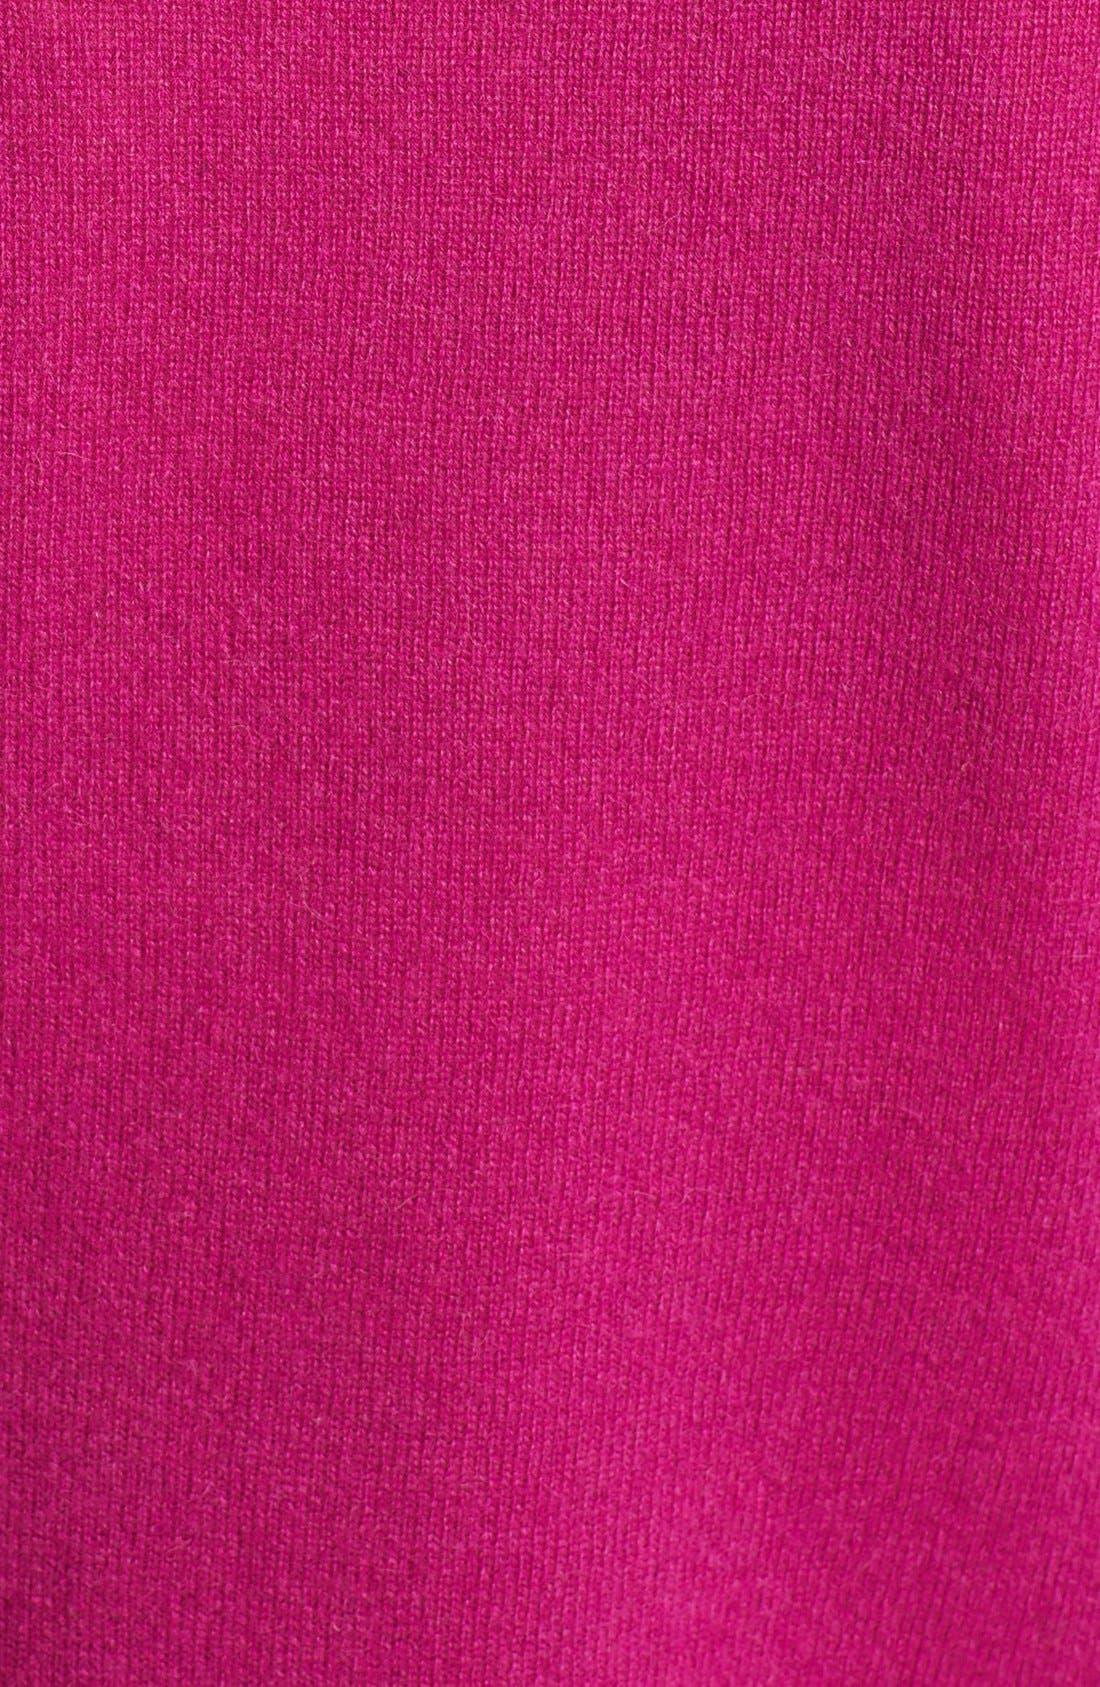 ,                             Cashmere V-Neck Sweater,                             Alternate thumbnail 80, color,                             652